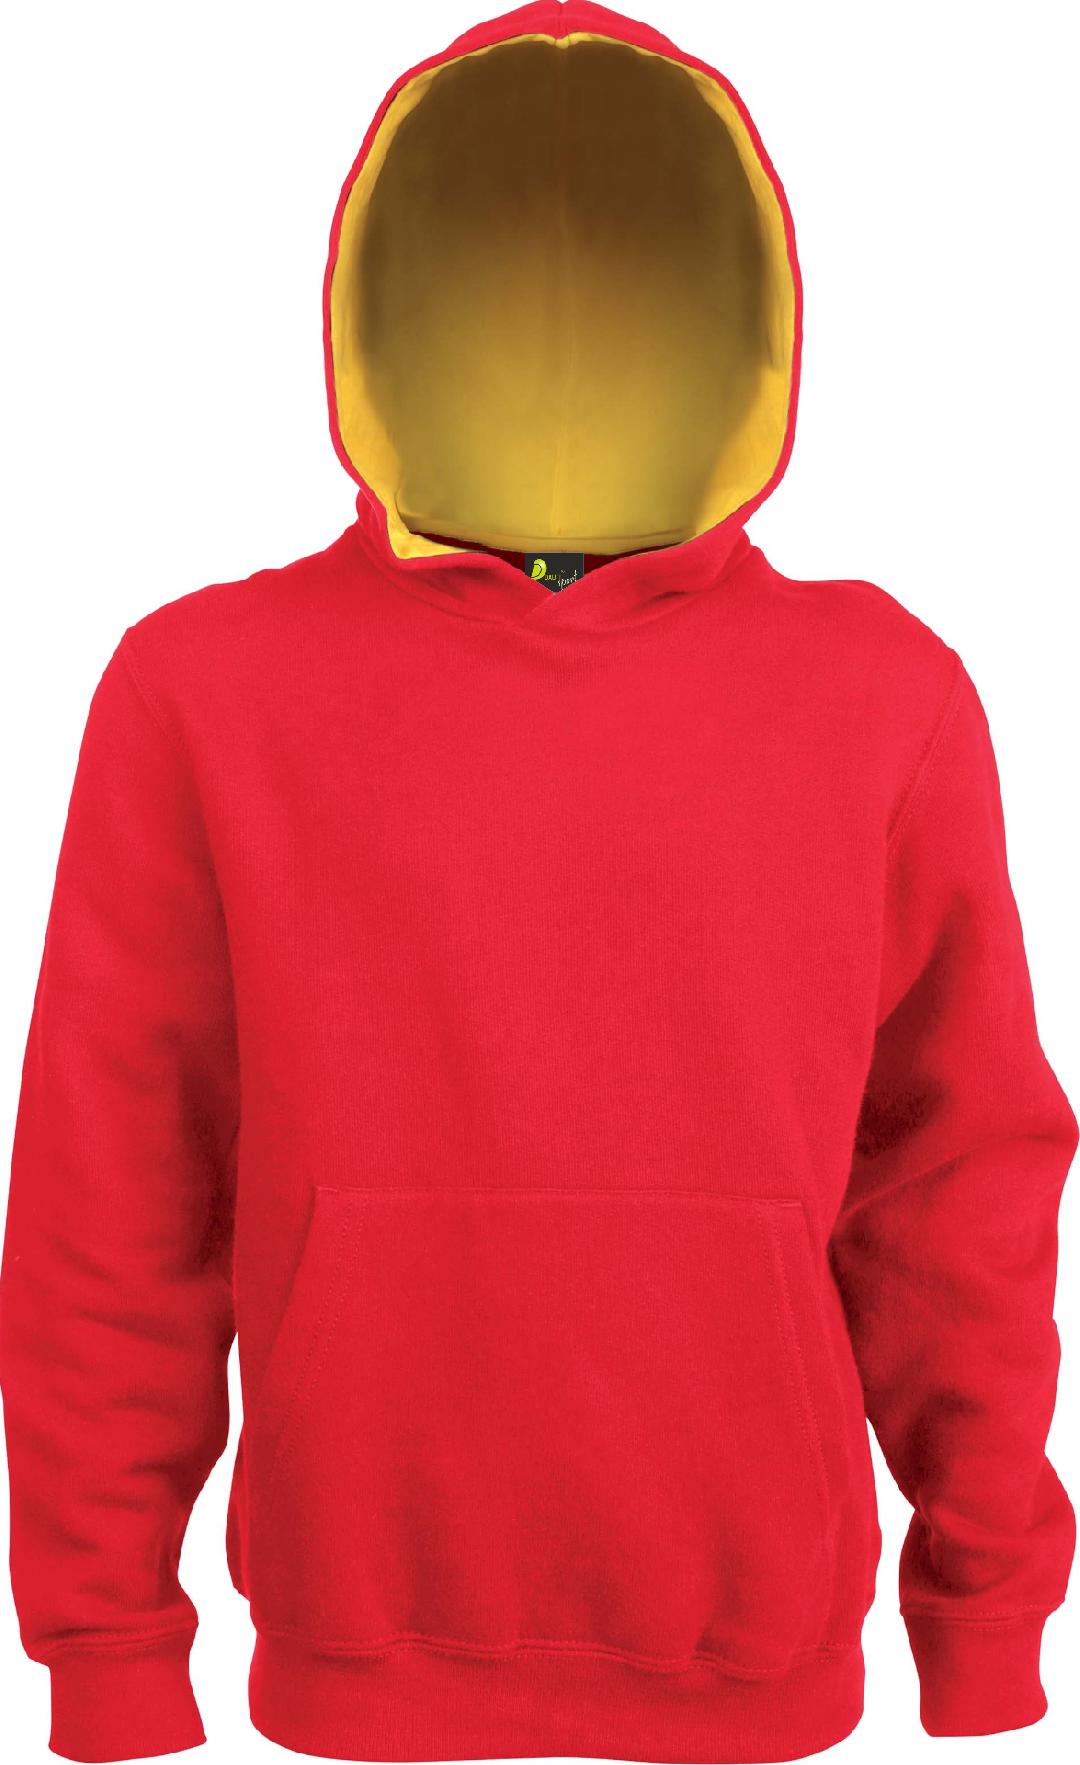 Hooded Child Sweatshirt - Madalena do Mar